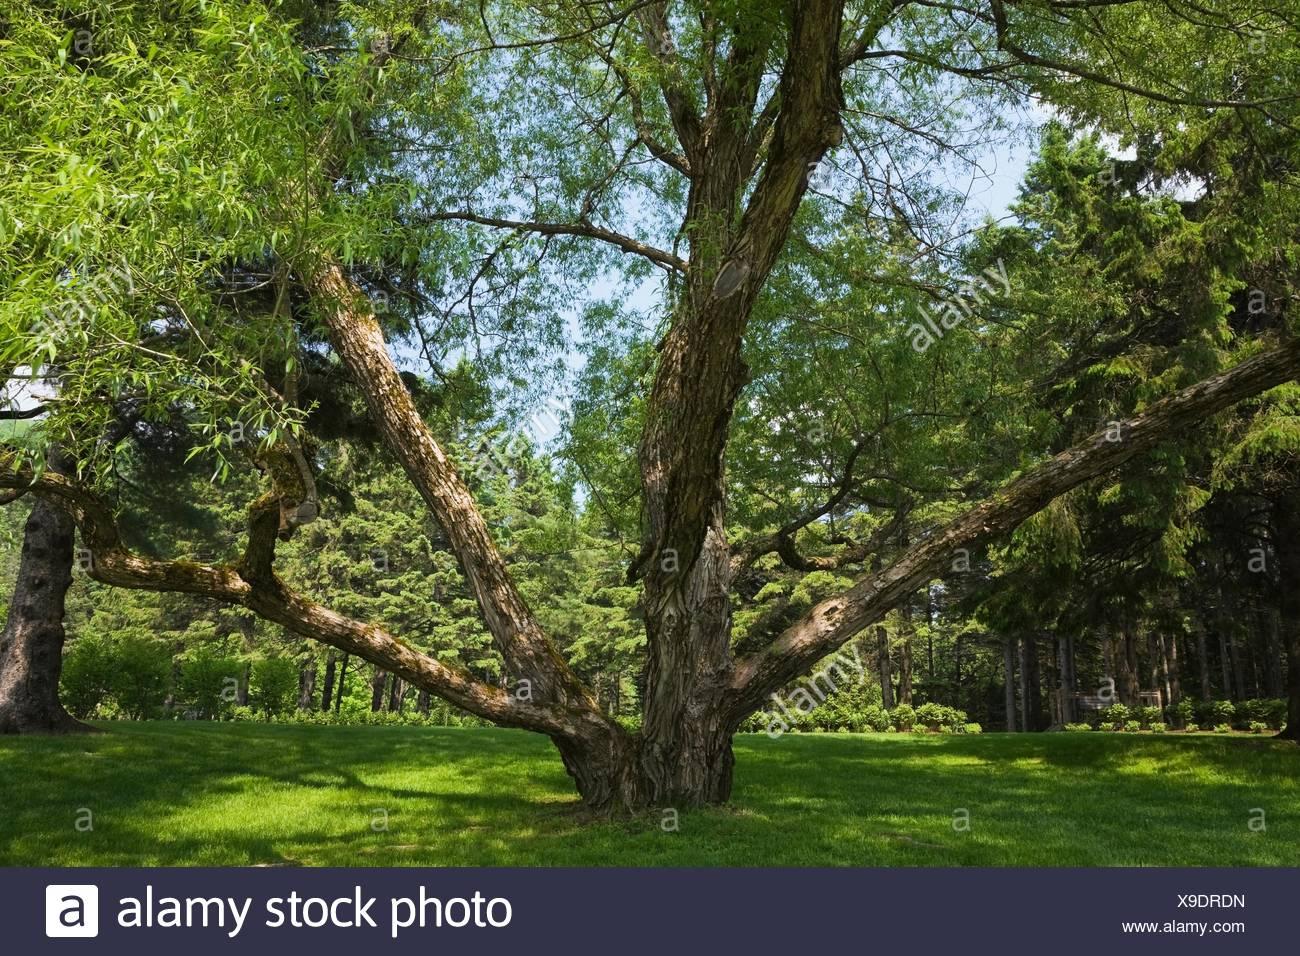 Große Alten Beschnitten Weide Salix Im Land Garten Im Frühling